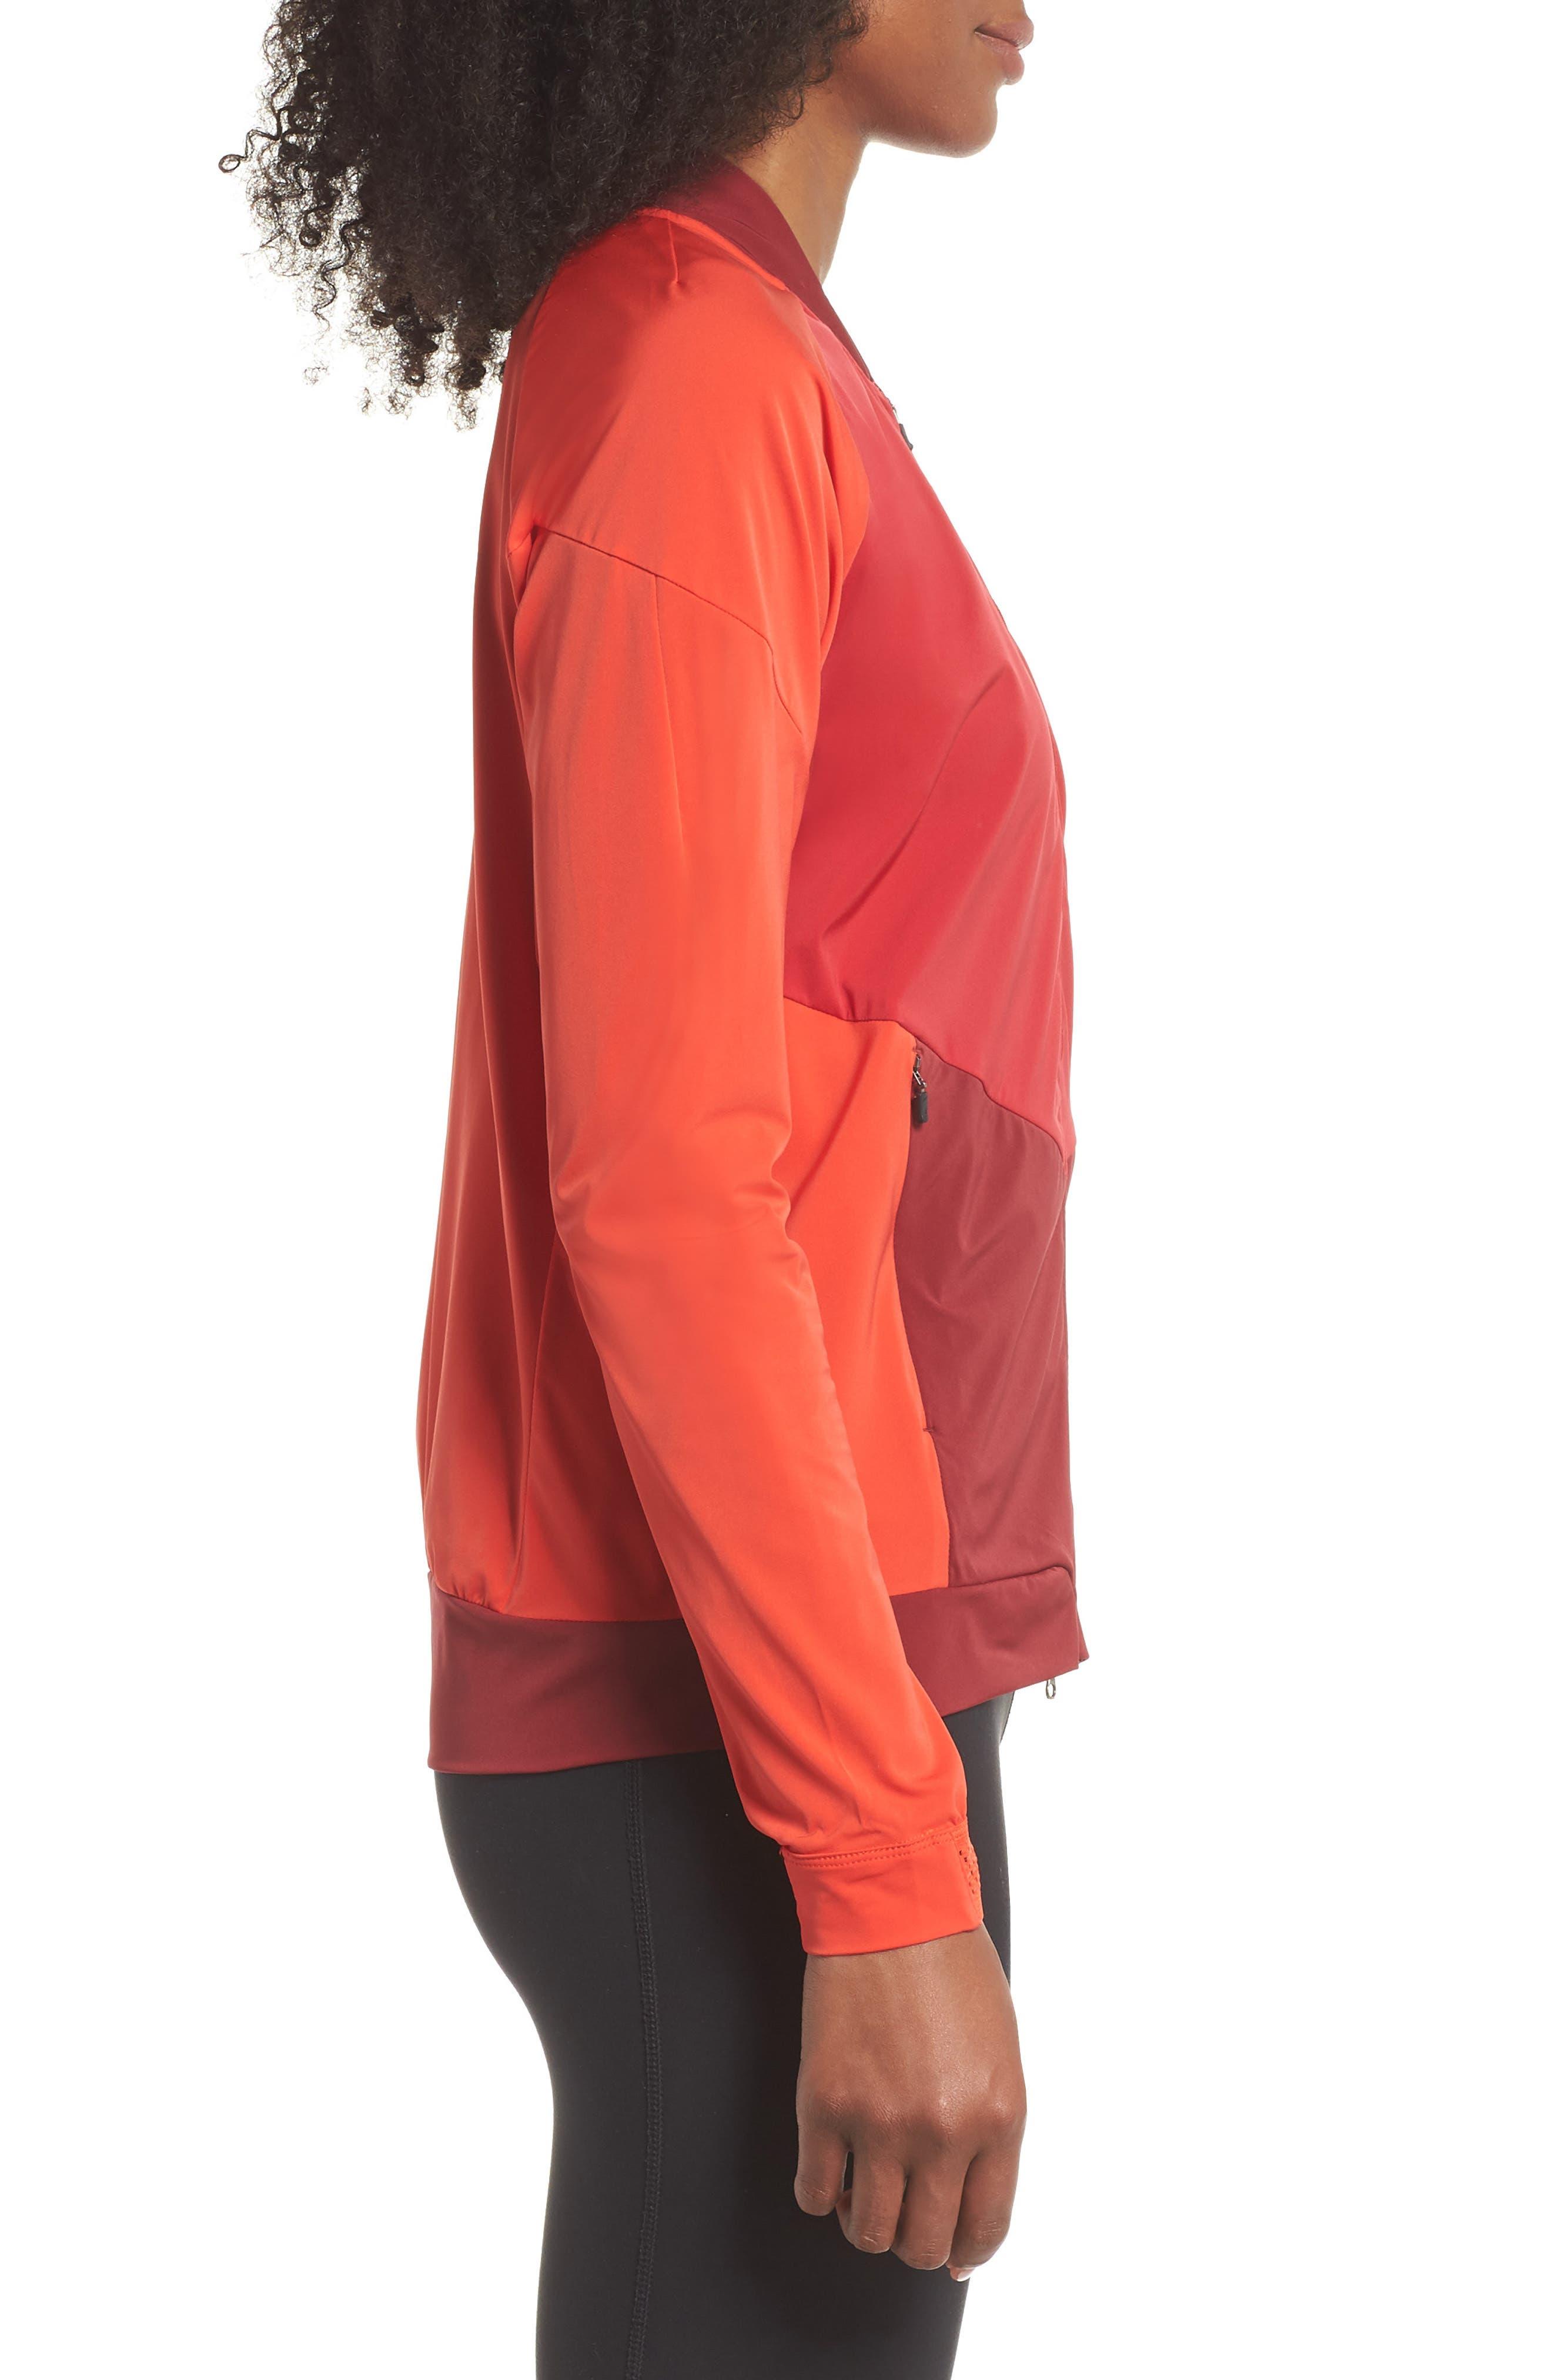 Dry Stadium Jacket,                             Alternate thumbnail 3, color,                             Habanero Red/ Coral